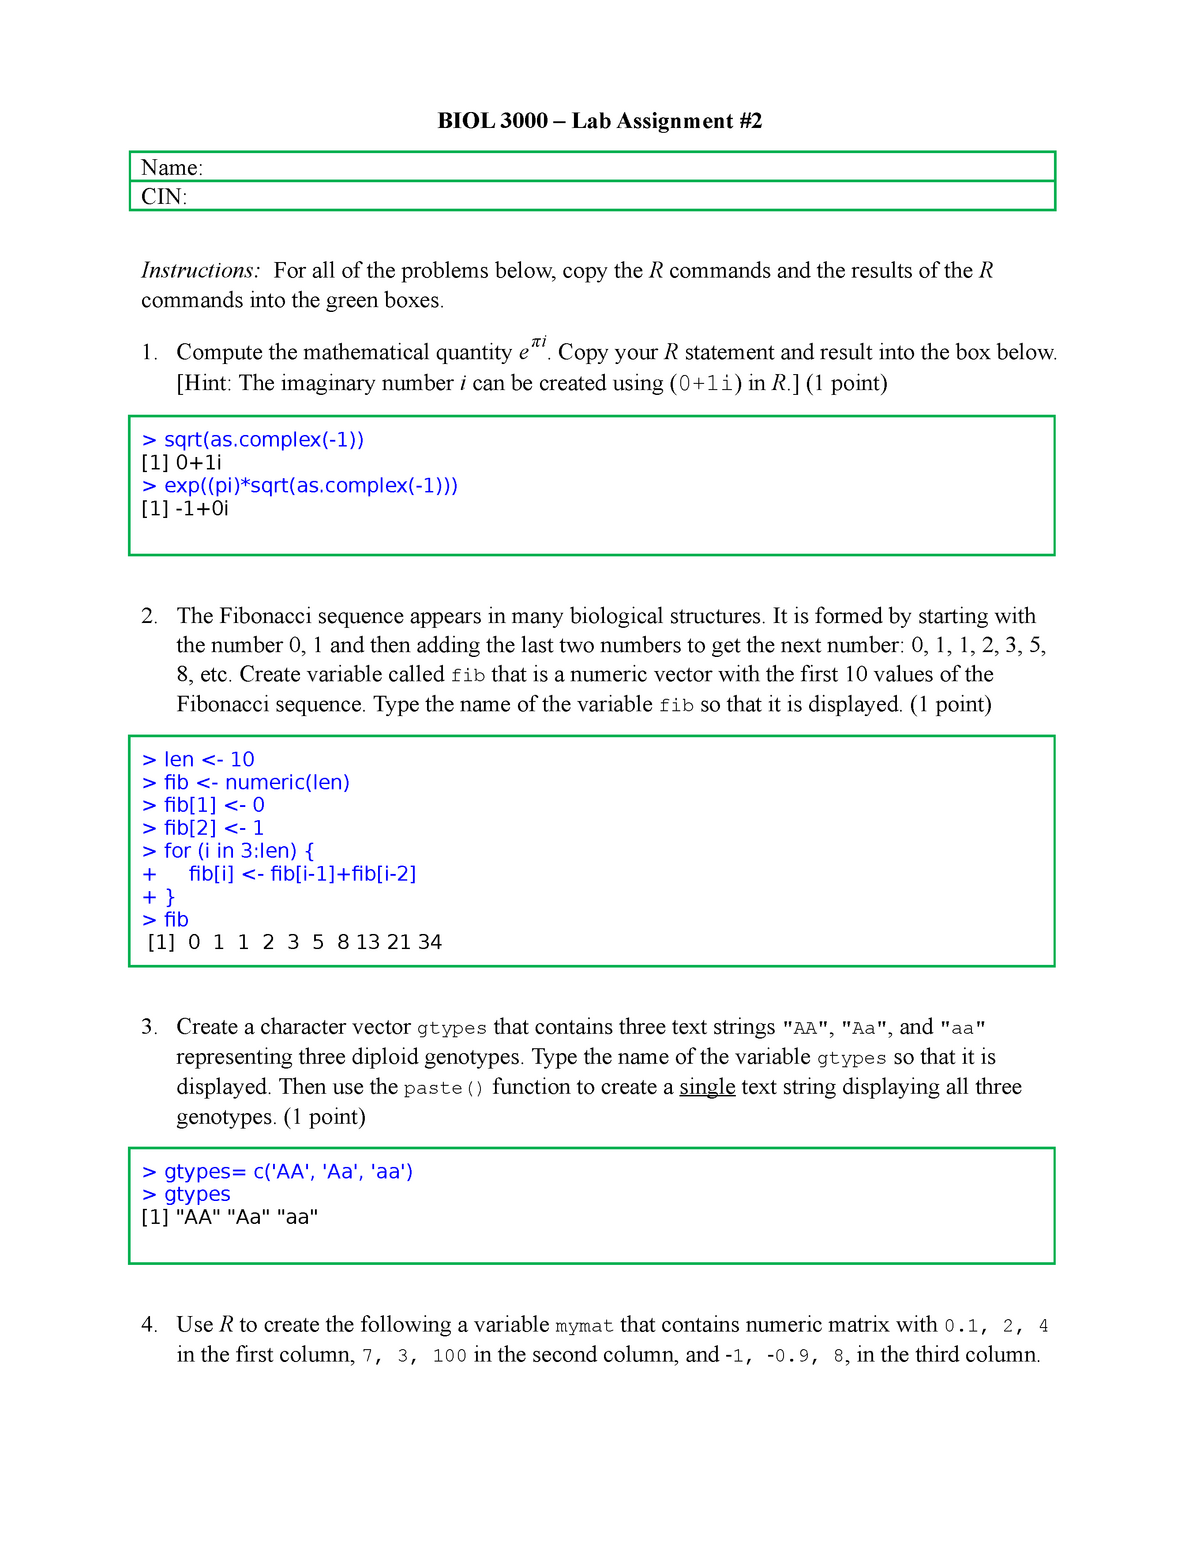 Lab Assignment 2UUU - INTERMEDIARE ACCOUNTING ACC309 - StuDocu